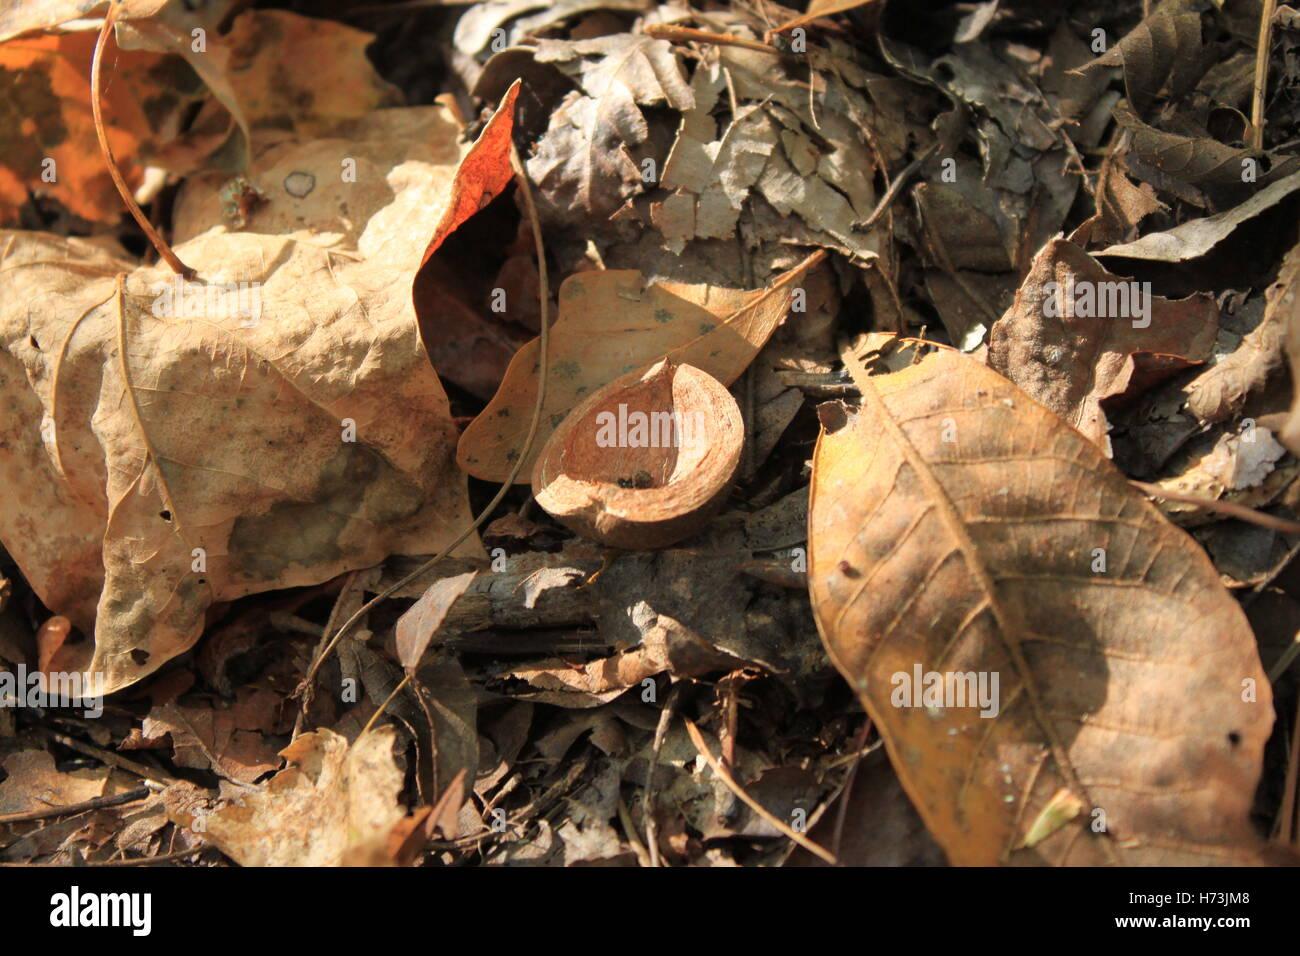 Hickory nut half (Carya glabra) - Stock Image